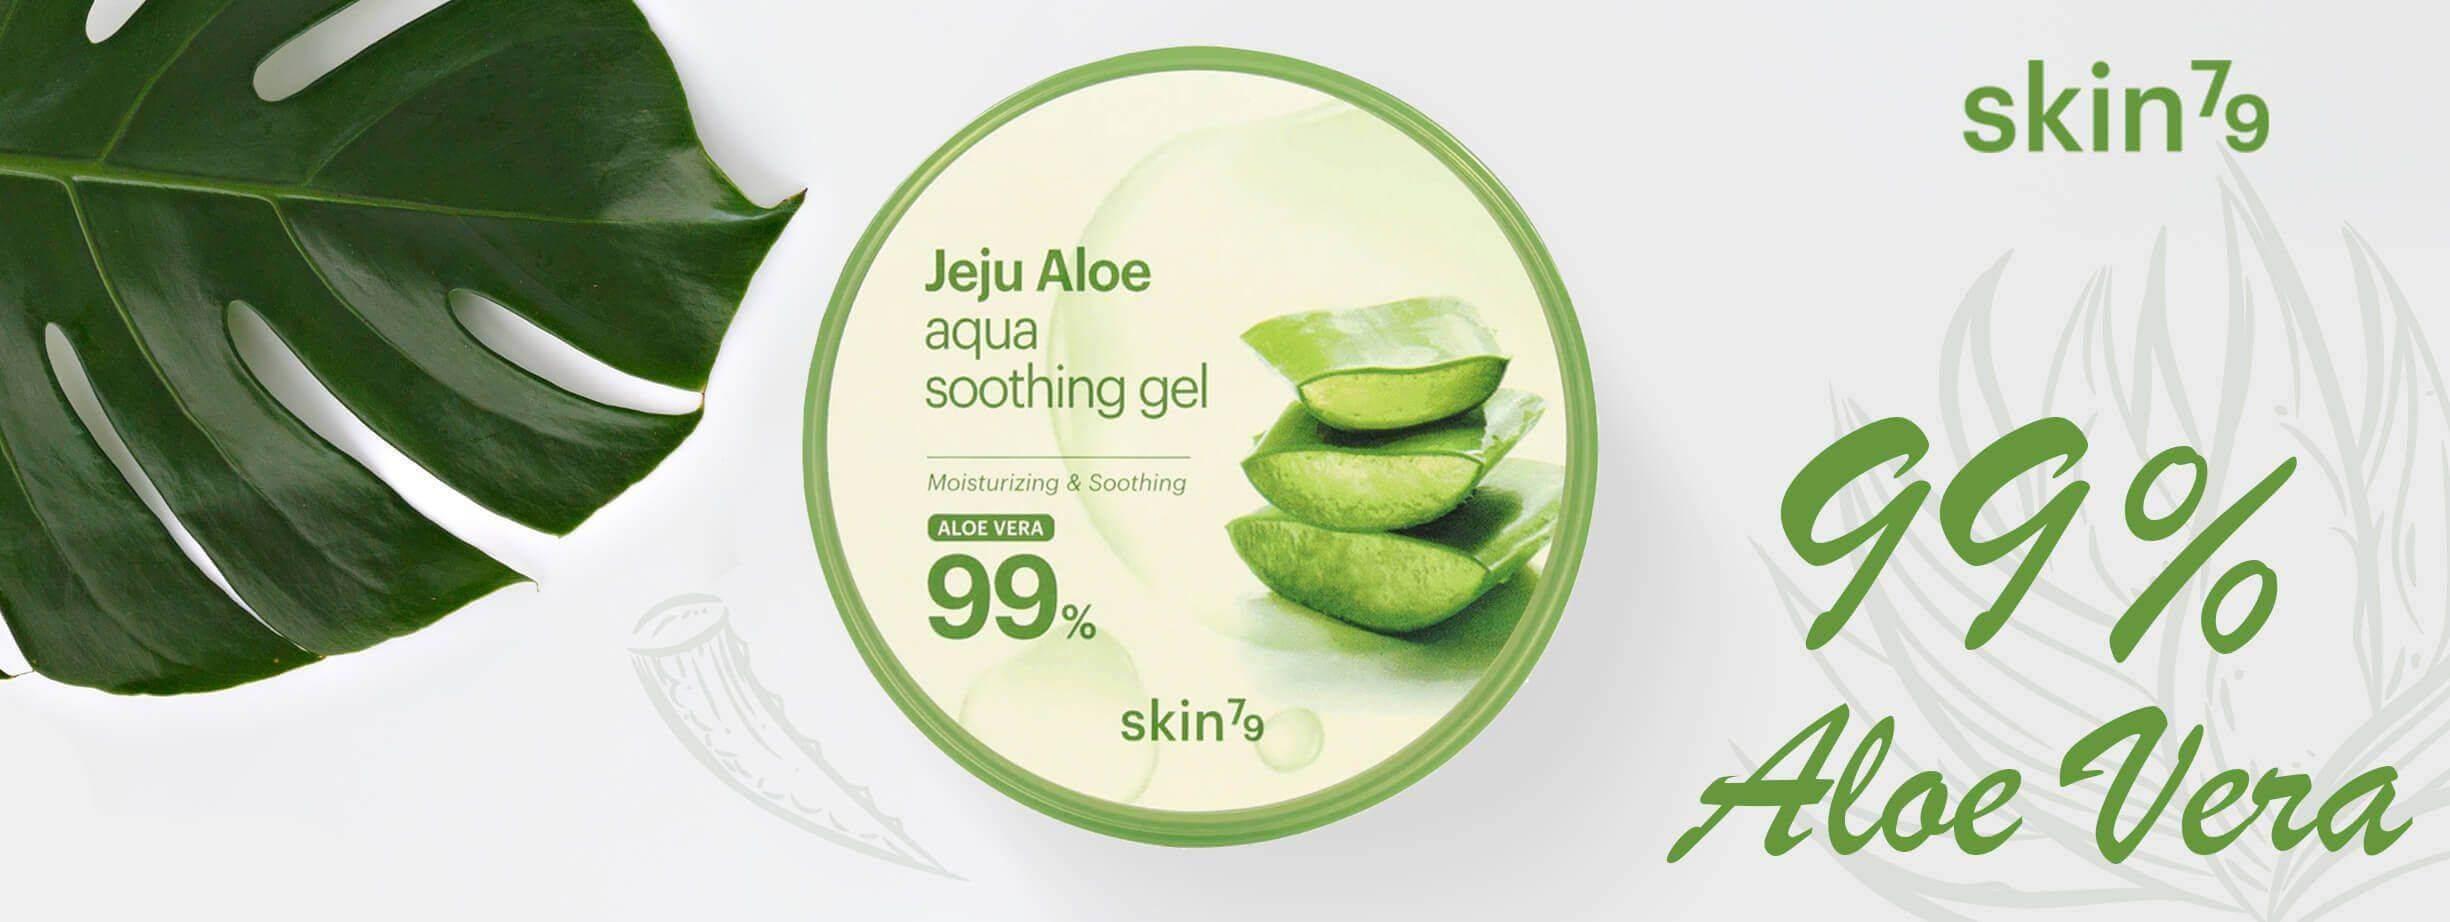 Skin79 aloesowy żel aloe soothing 99%